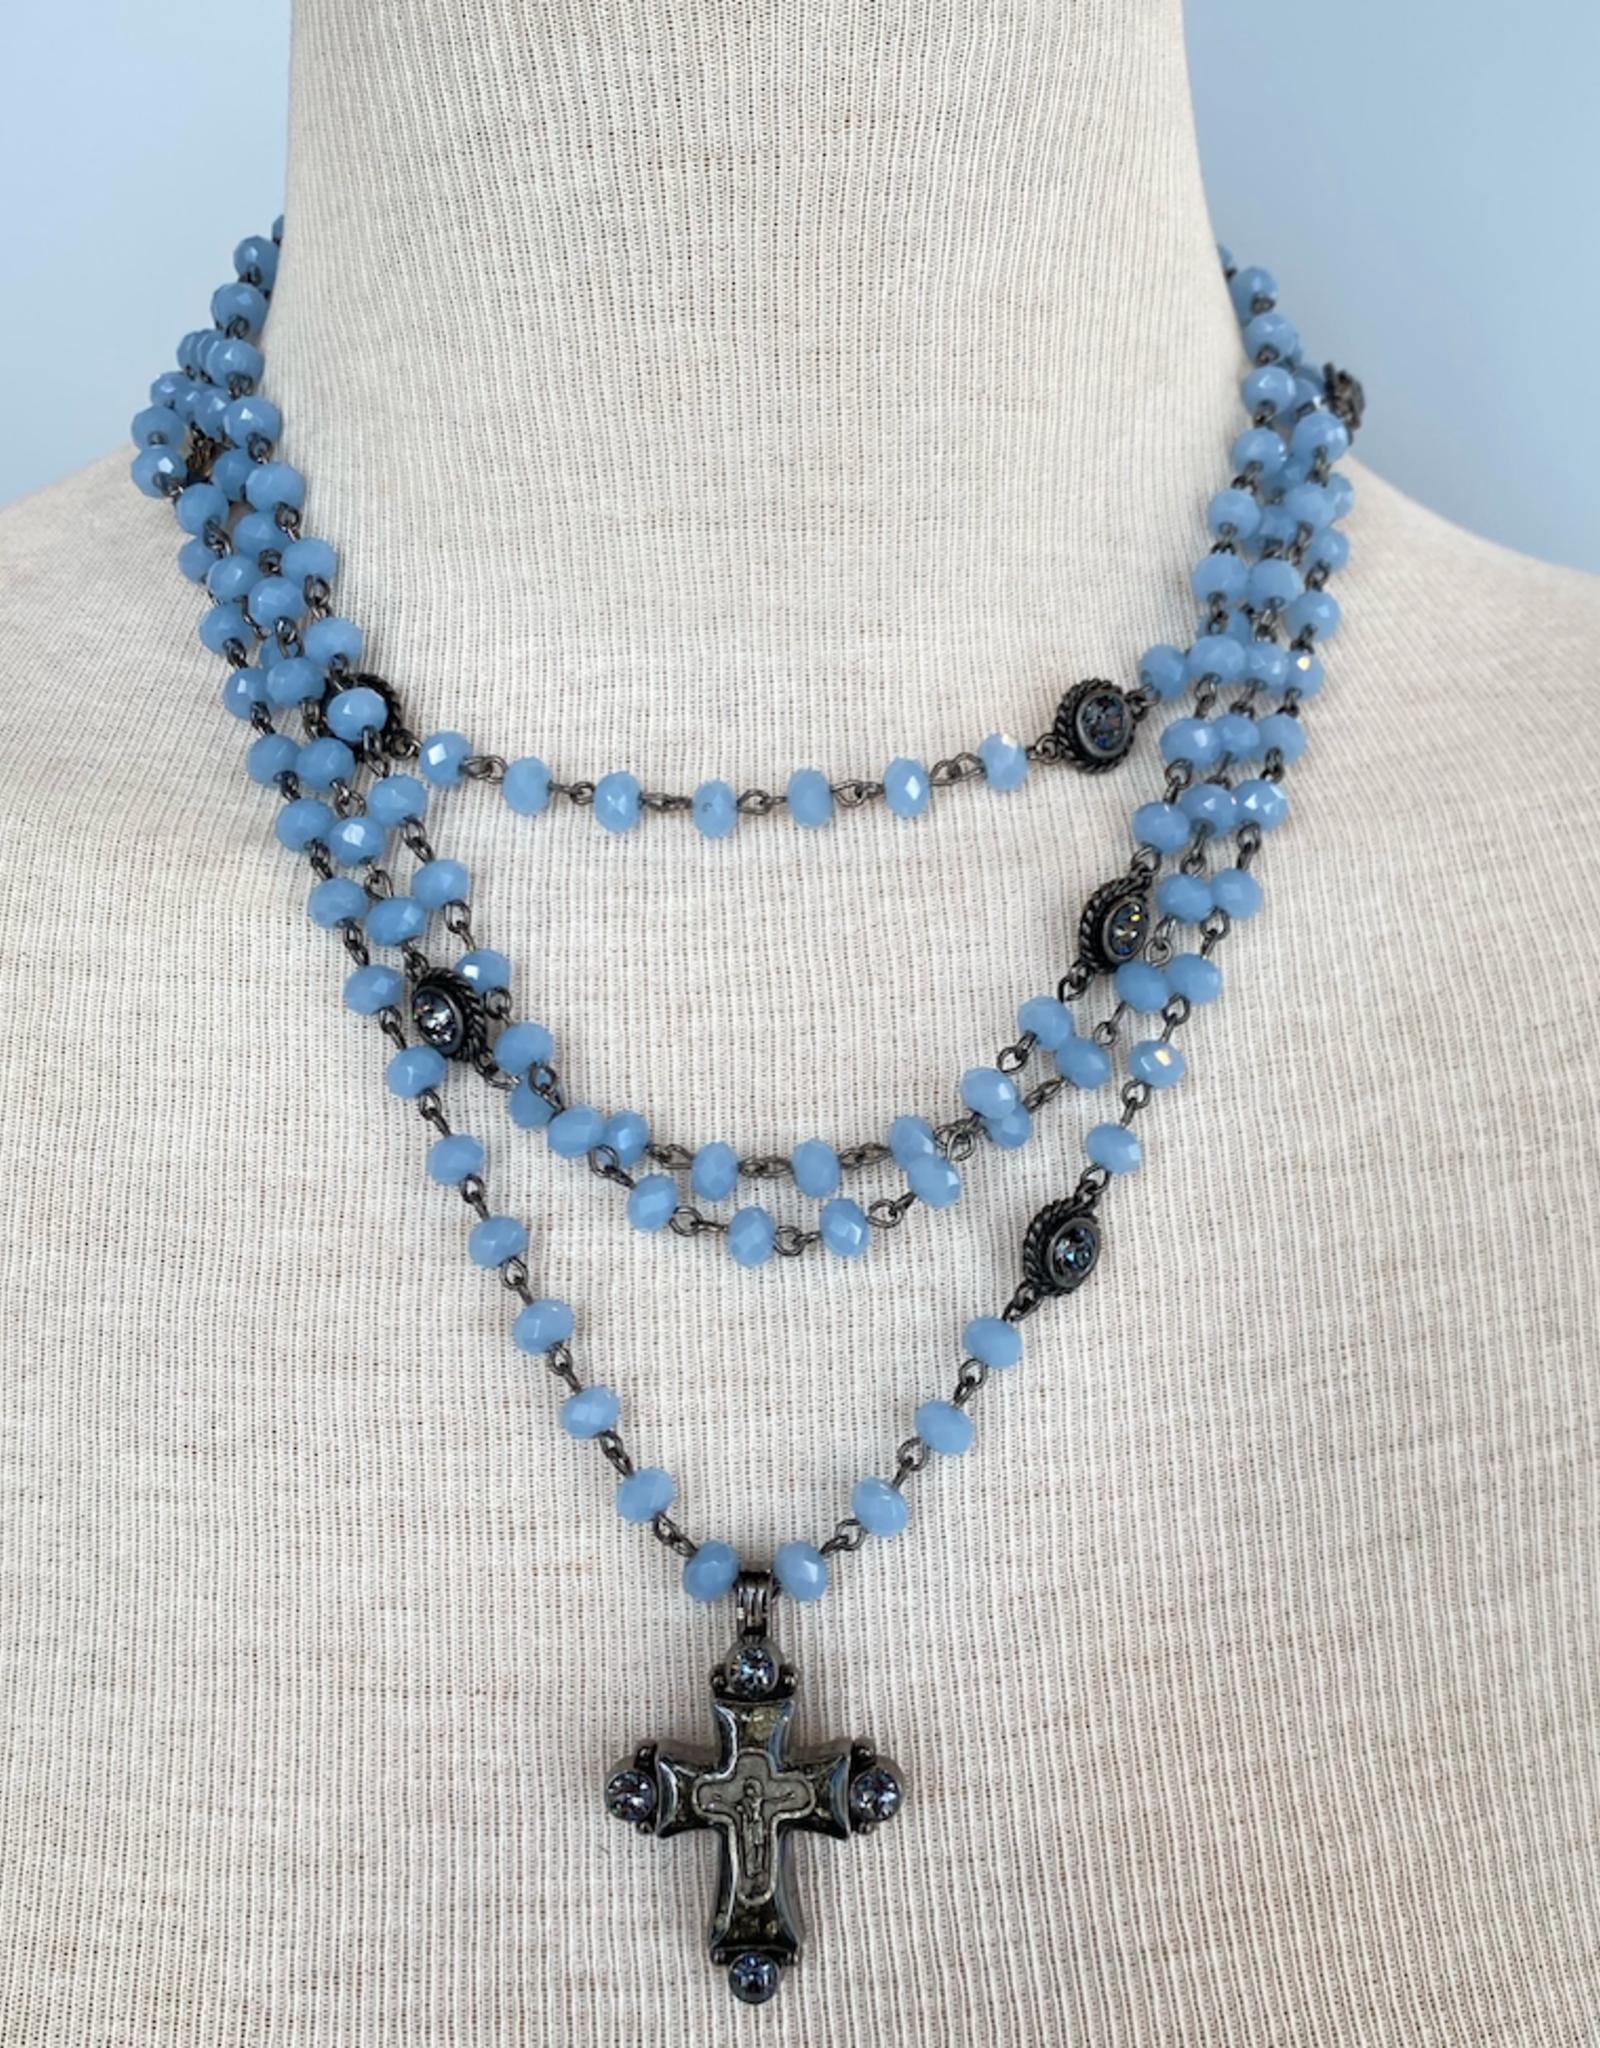 Virgins Saints & Angels MAGDALENA Light Blue Opal with Cross Pendant